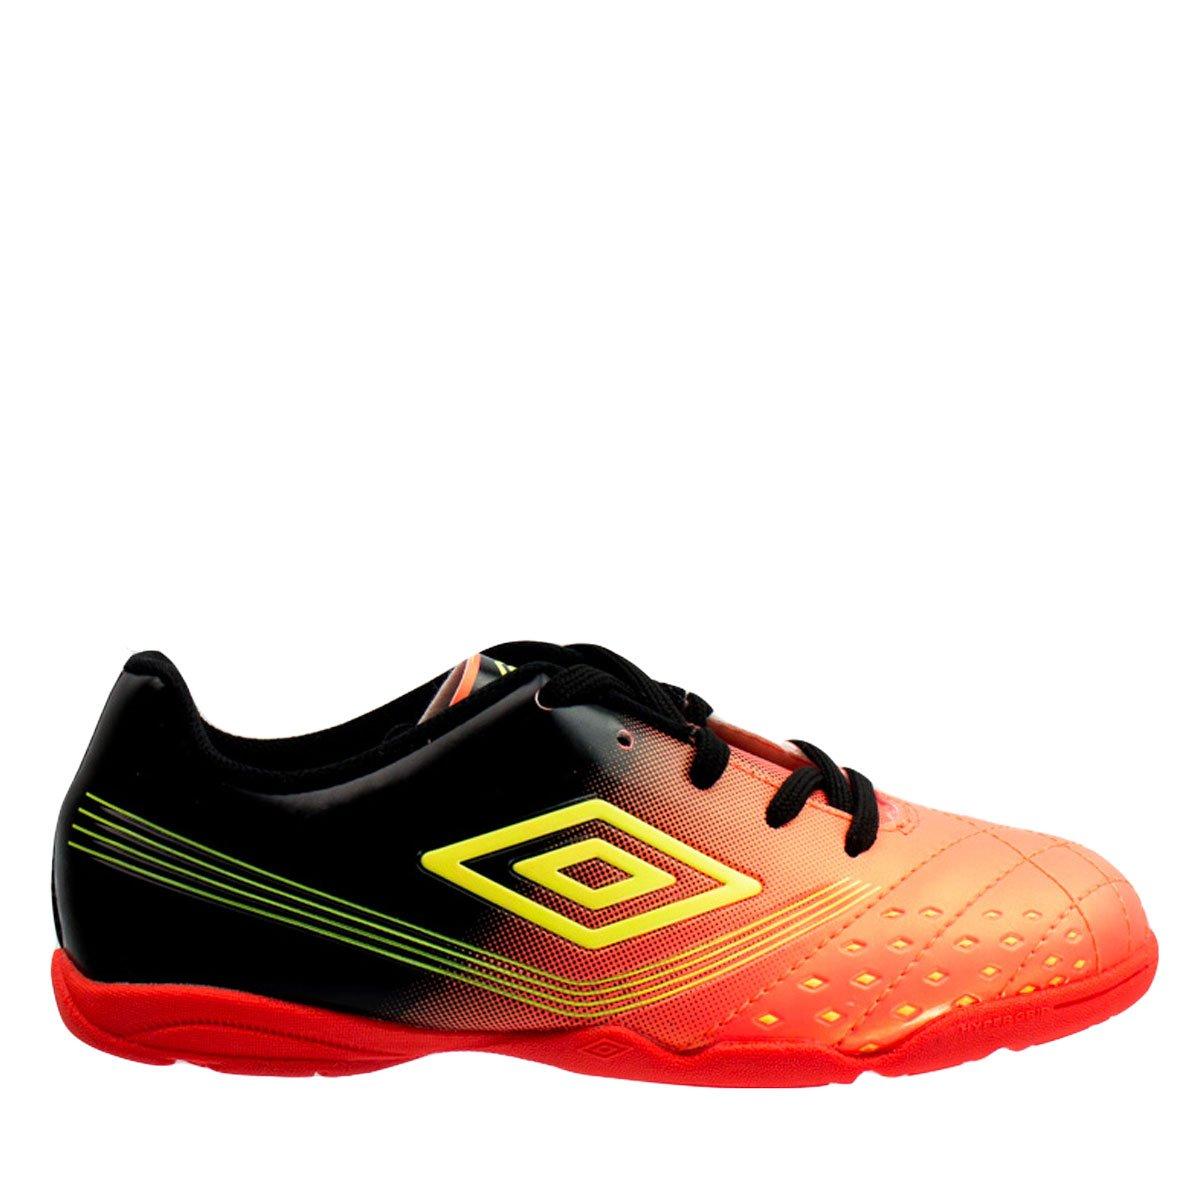 f1aa71c683 Bizz Store - Chuteira Infantil Futsal Umbro Indoor Fifty